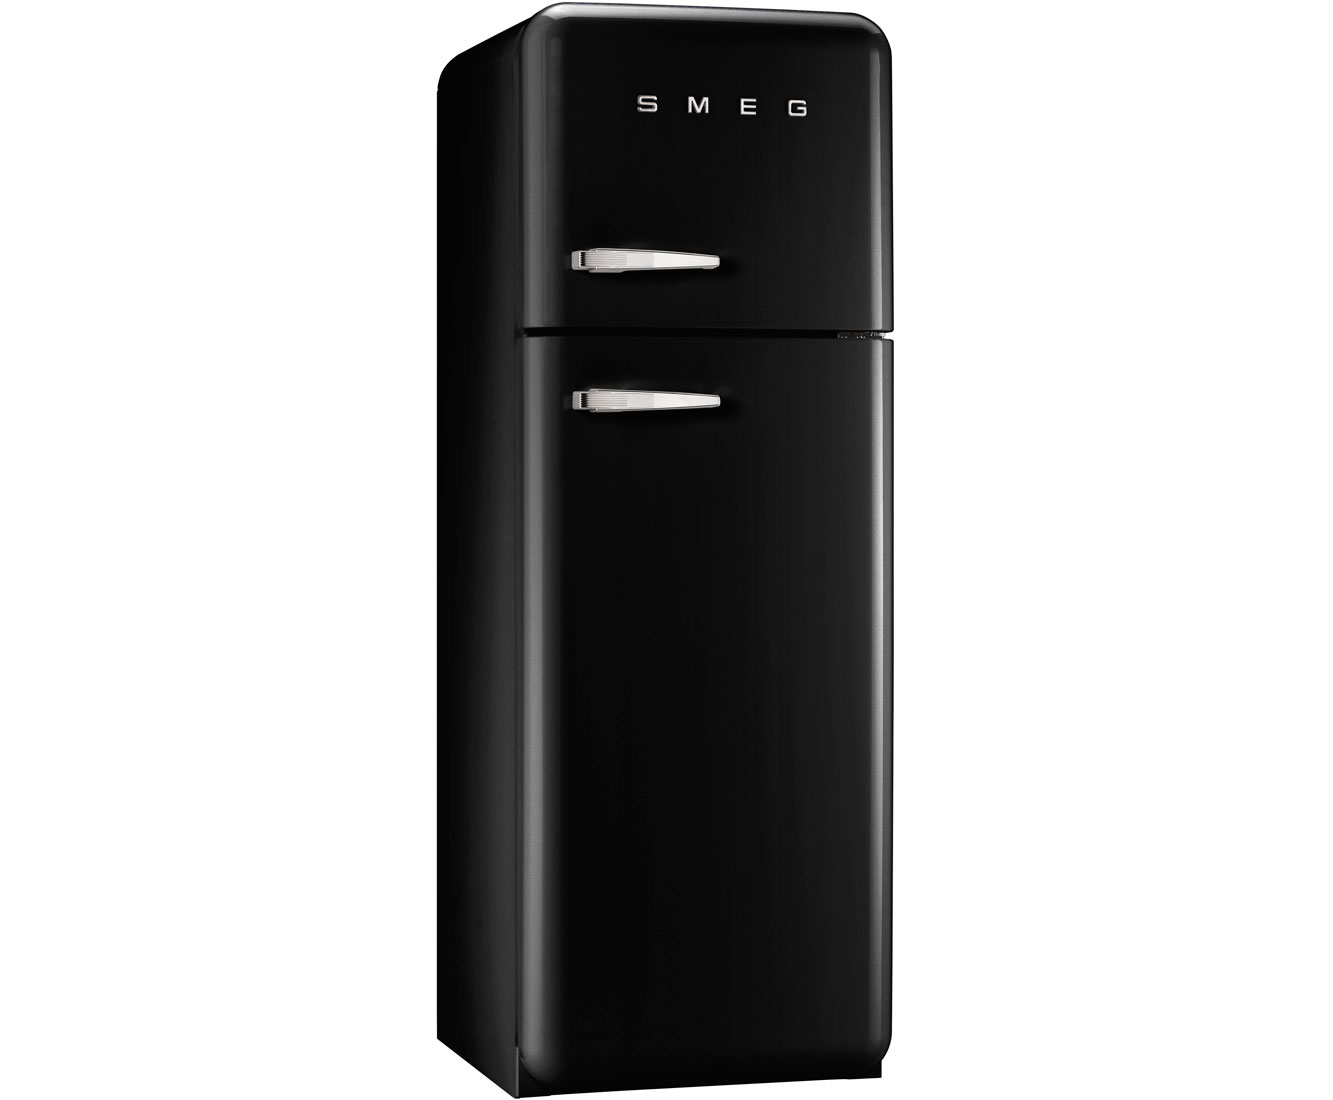 Smeg Right Hand Hinge FAB30RFN Free Standing Fridge Freezer in Black